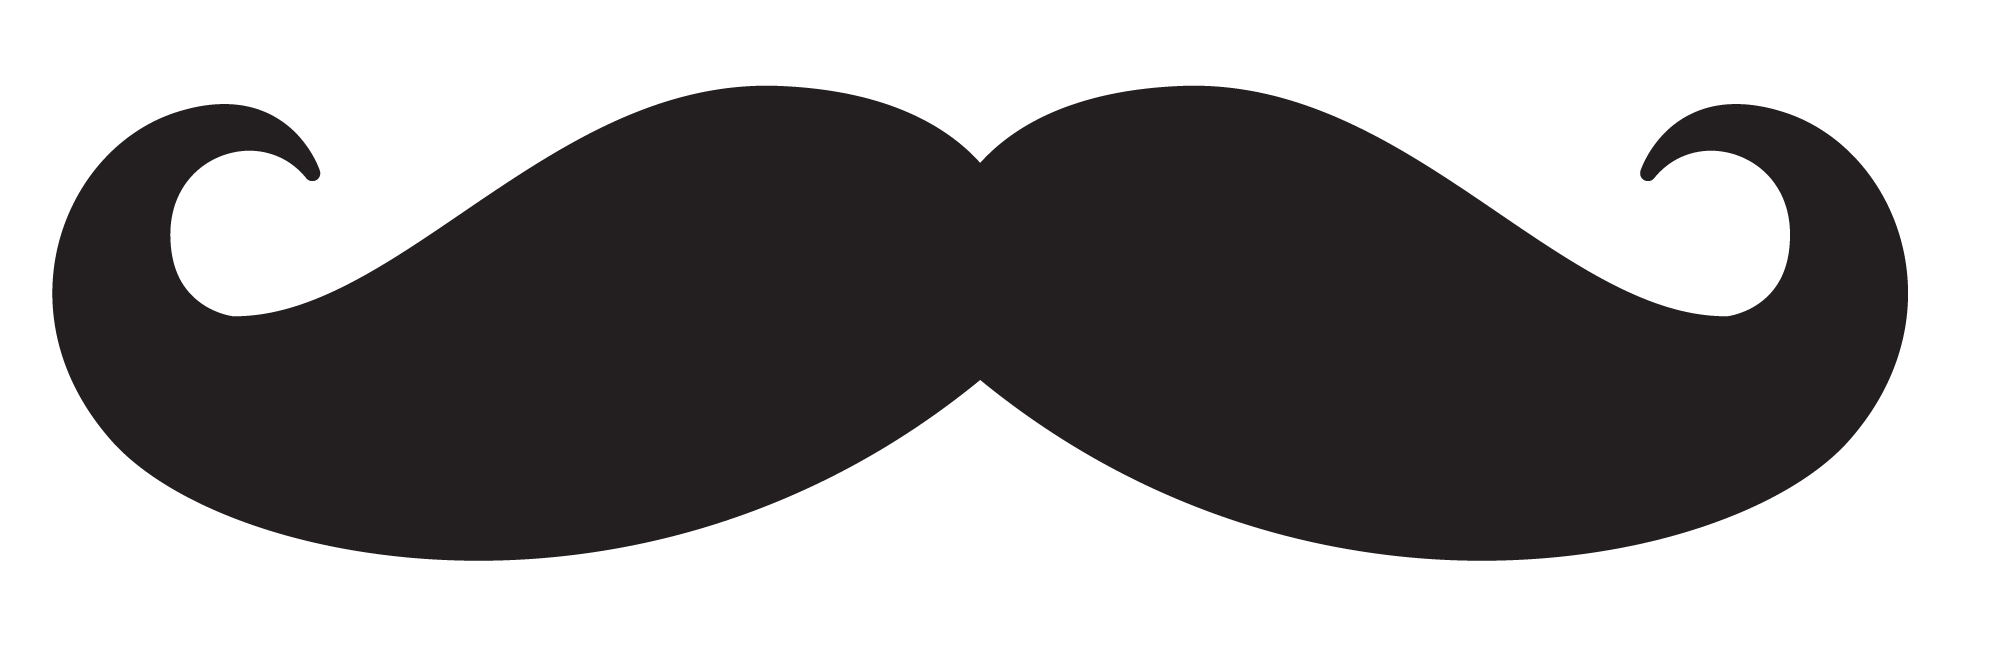 Clipart mustache clipart-Clipart mustache clipart-6